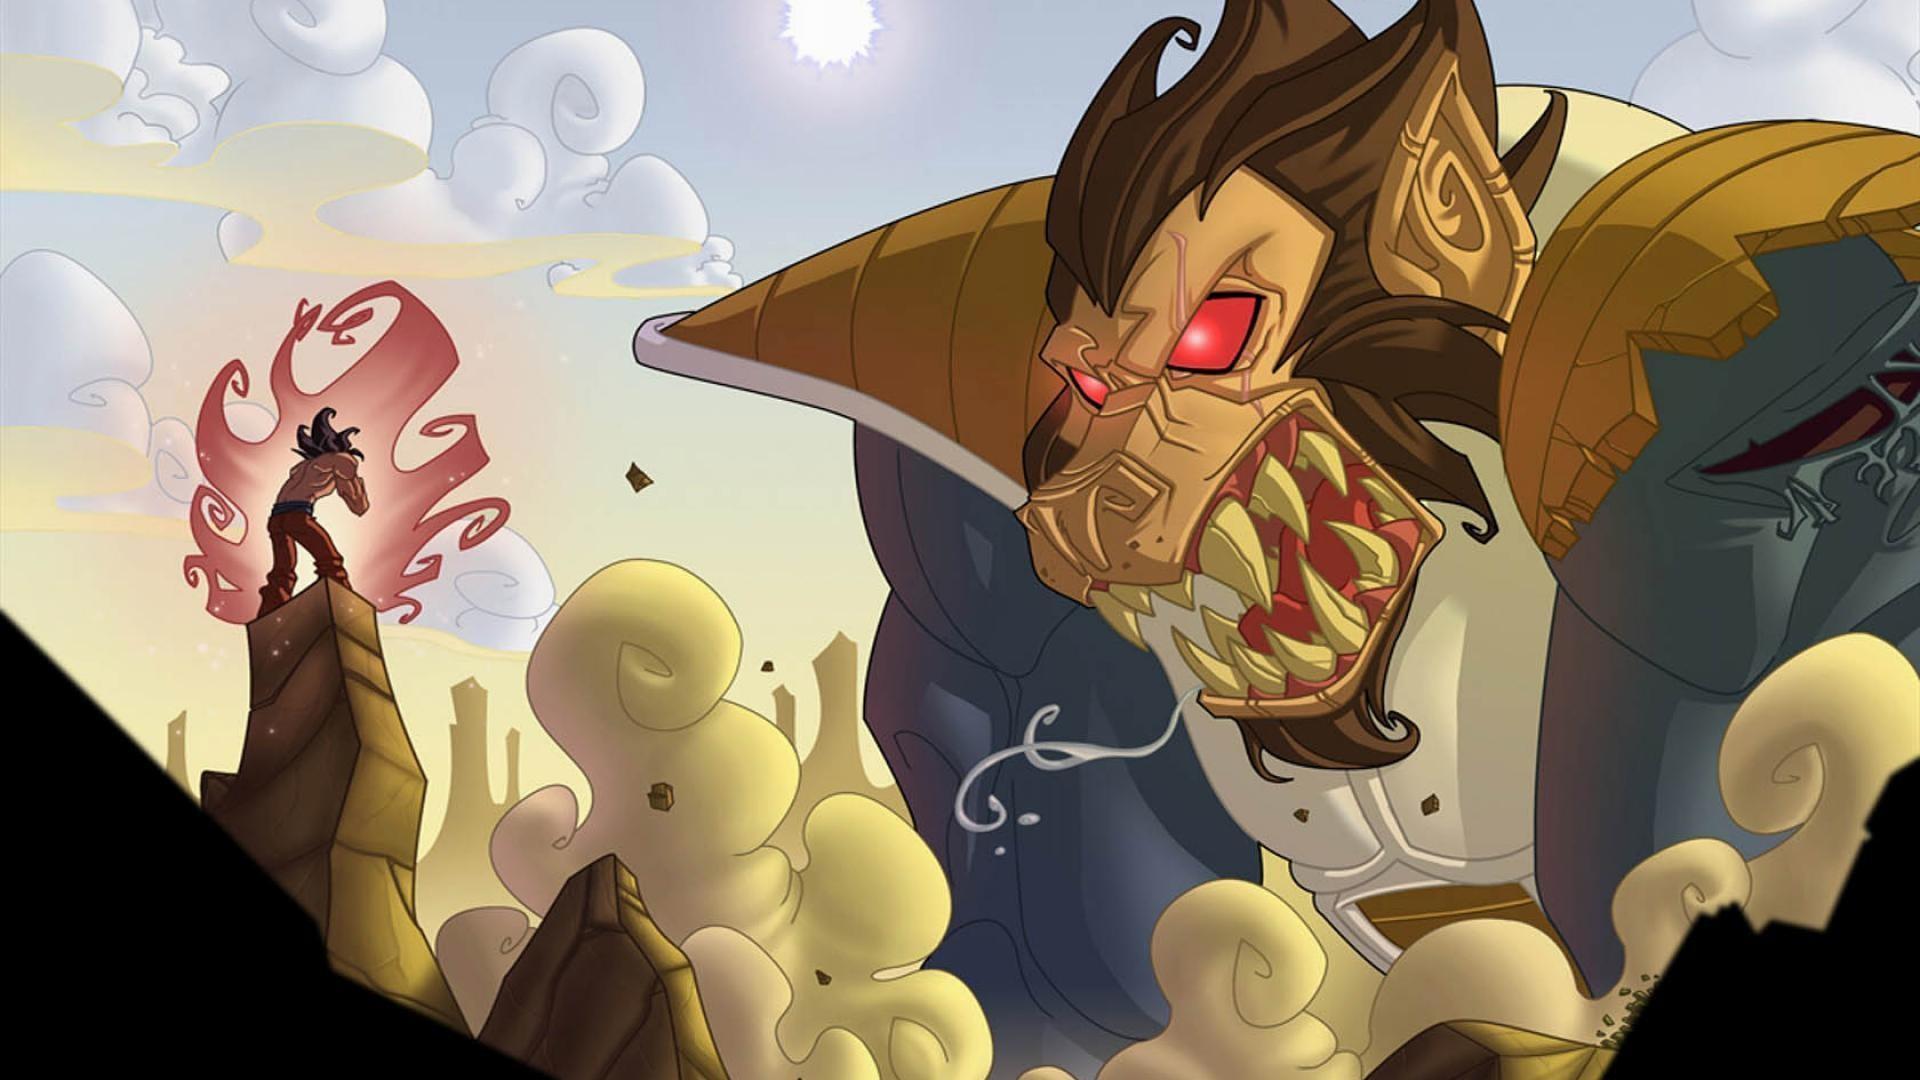 wallpaper.wiki-Goku-Dragon-Ball-Z-Image-Download-